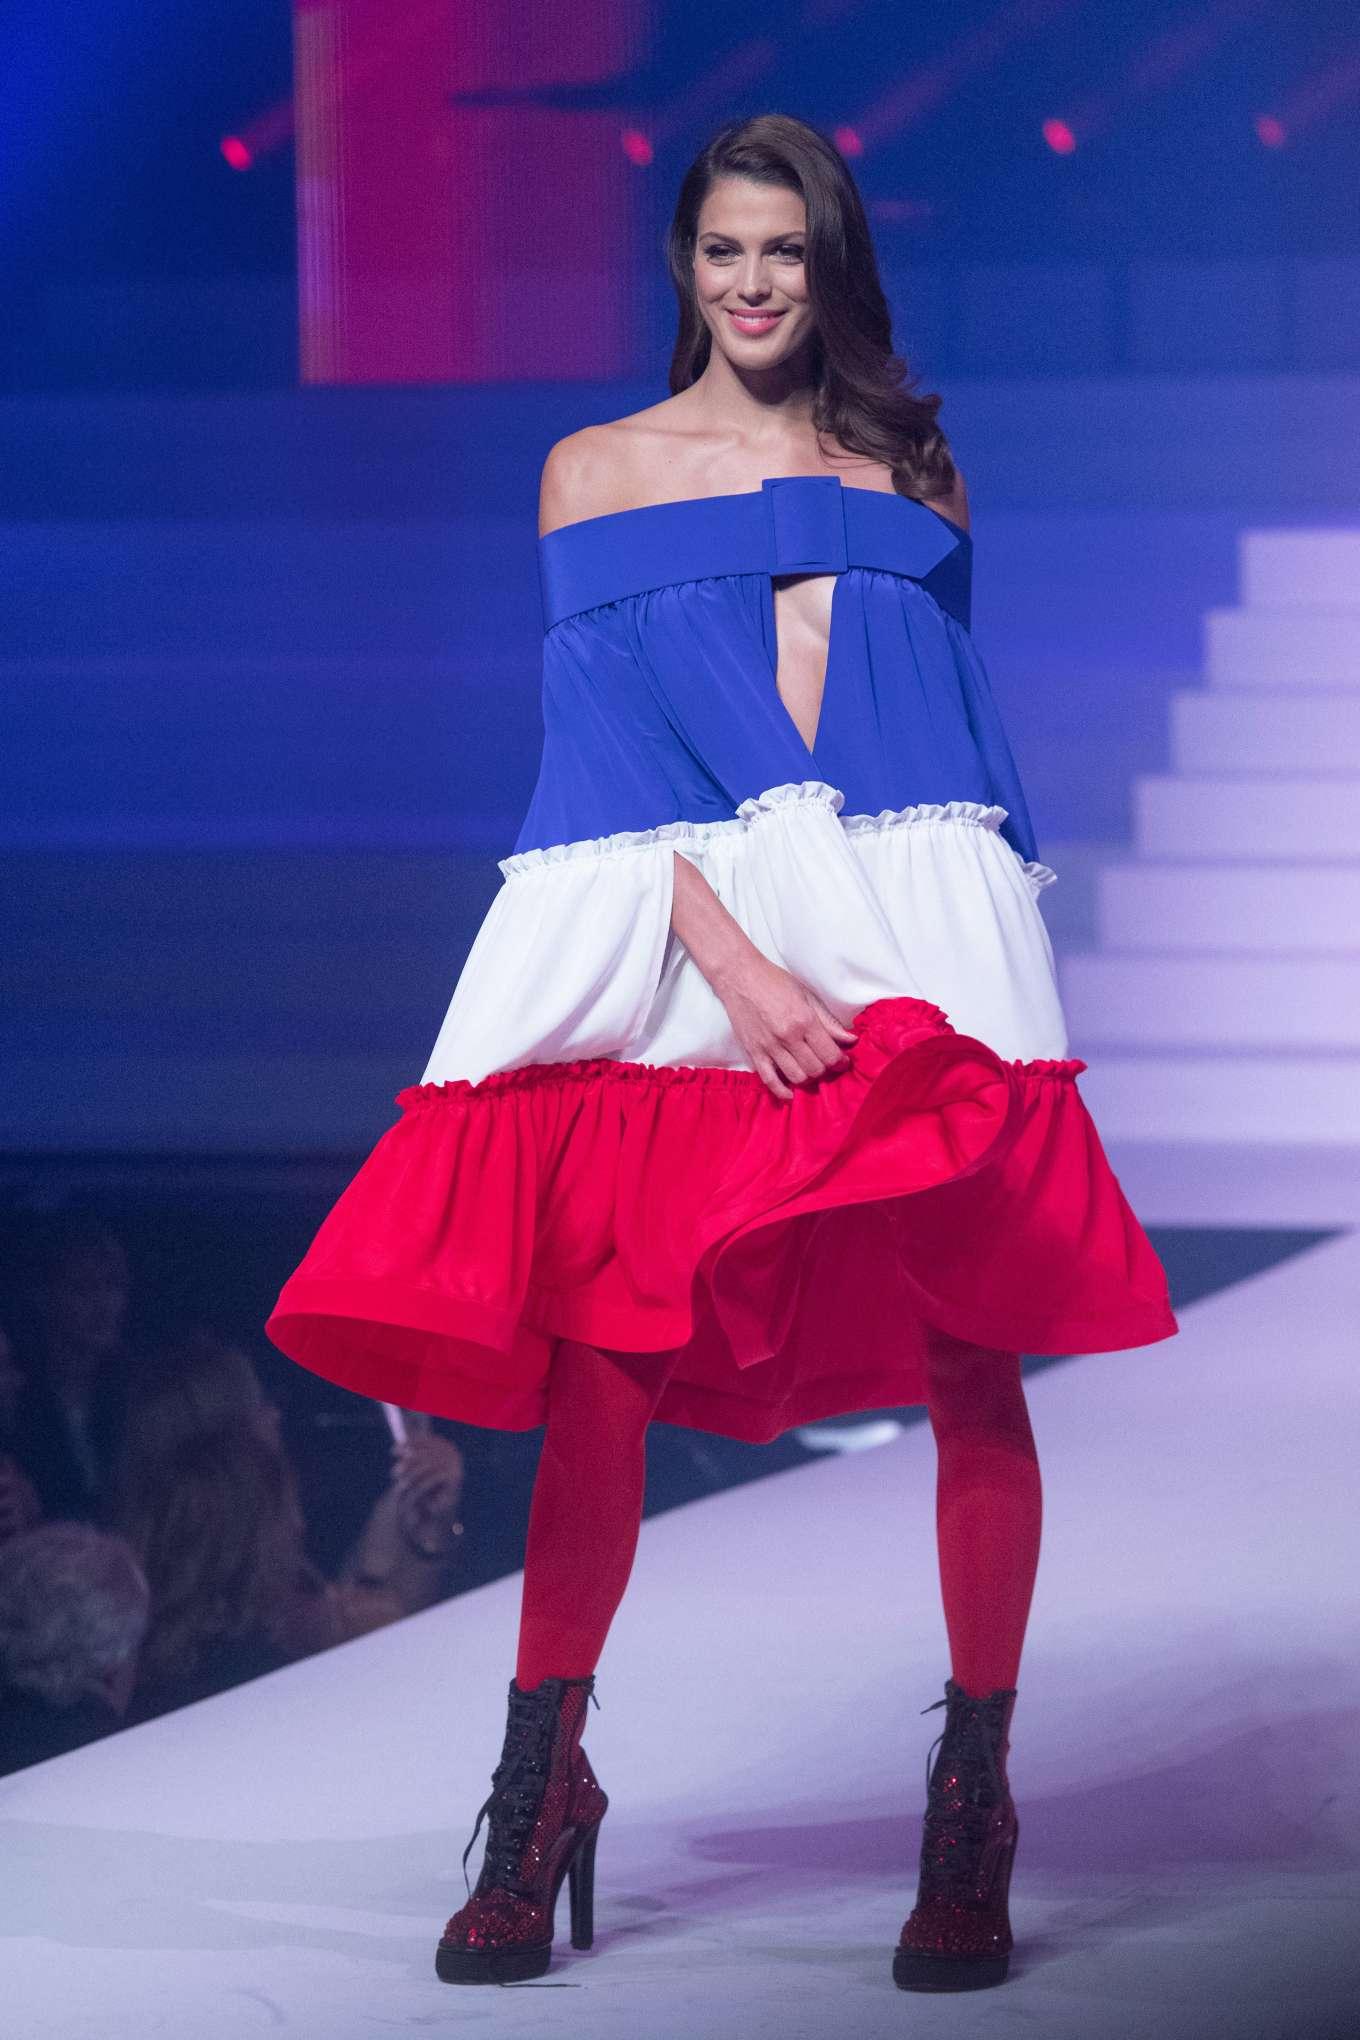 Iris Mittenaere 2020 : Iris Mittenaere – Jean-Paul Gaultier Runway Show in Paris-14